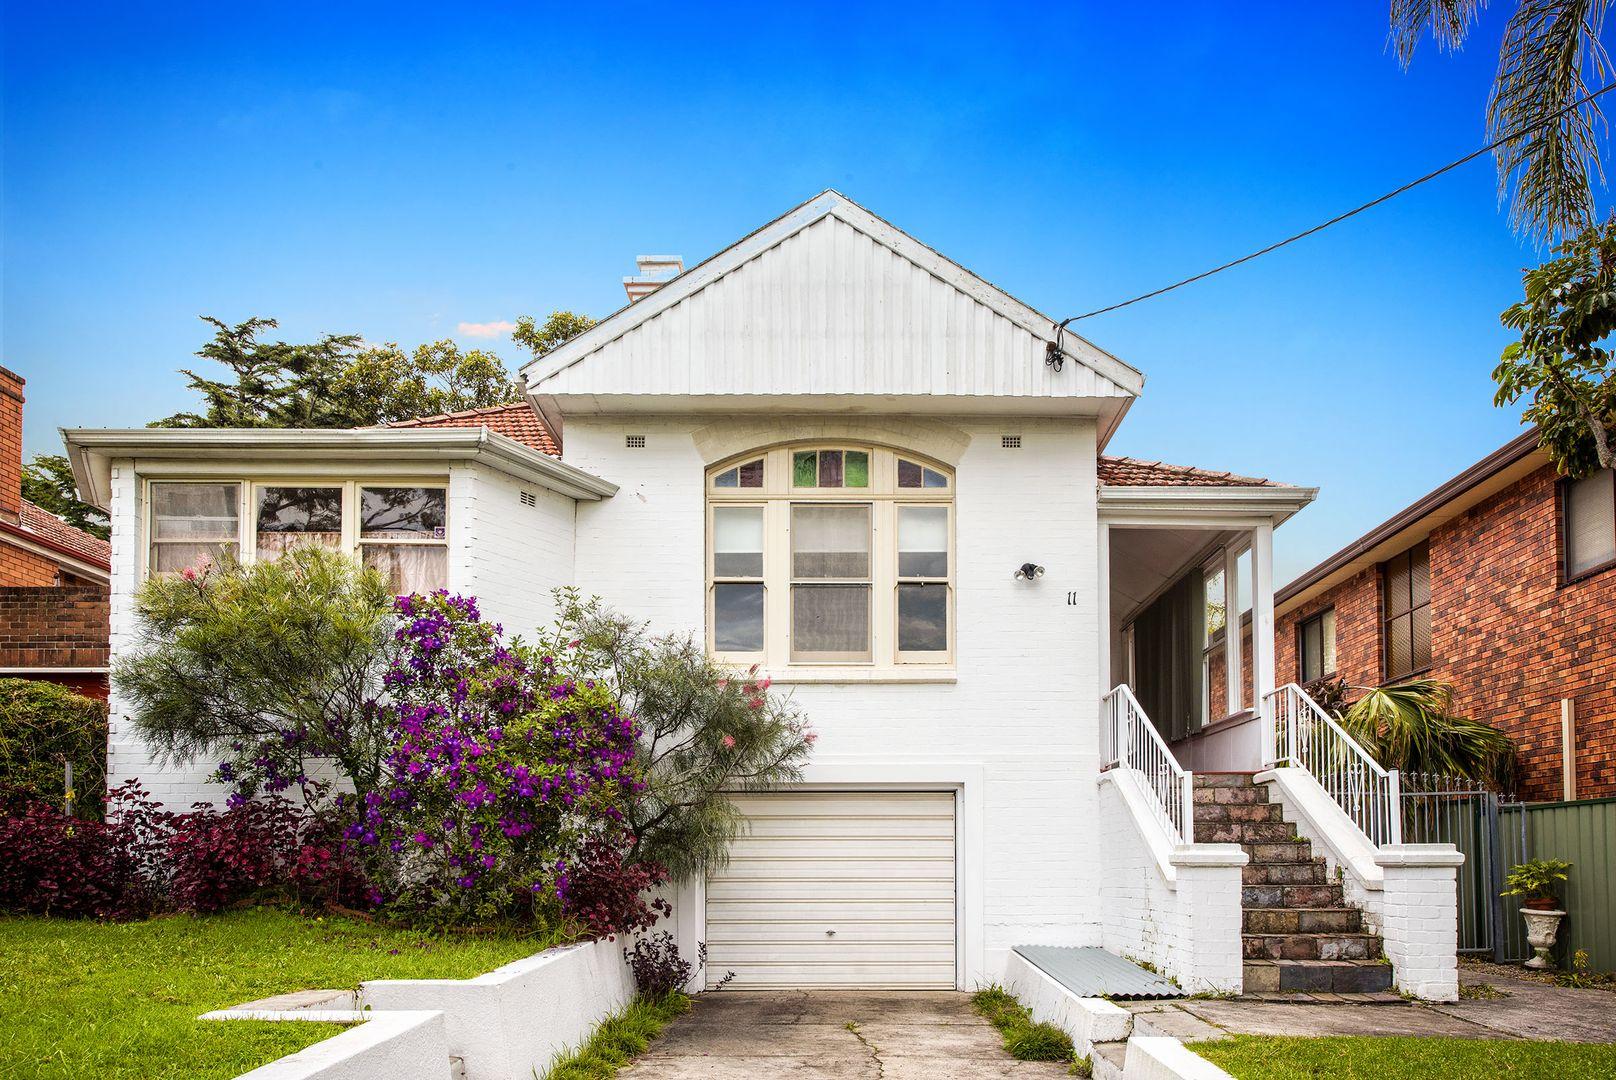 3/11 Emu Street, Strathfield NSW 2135, Image 0